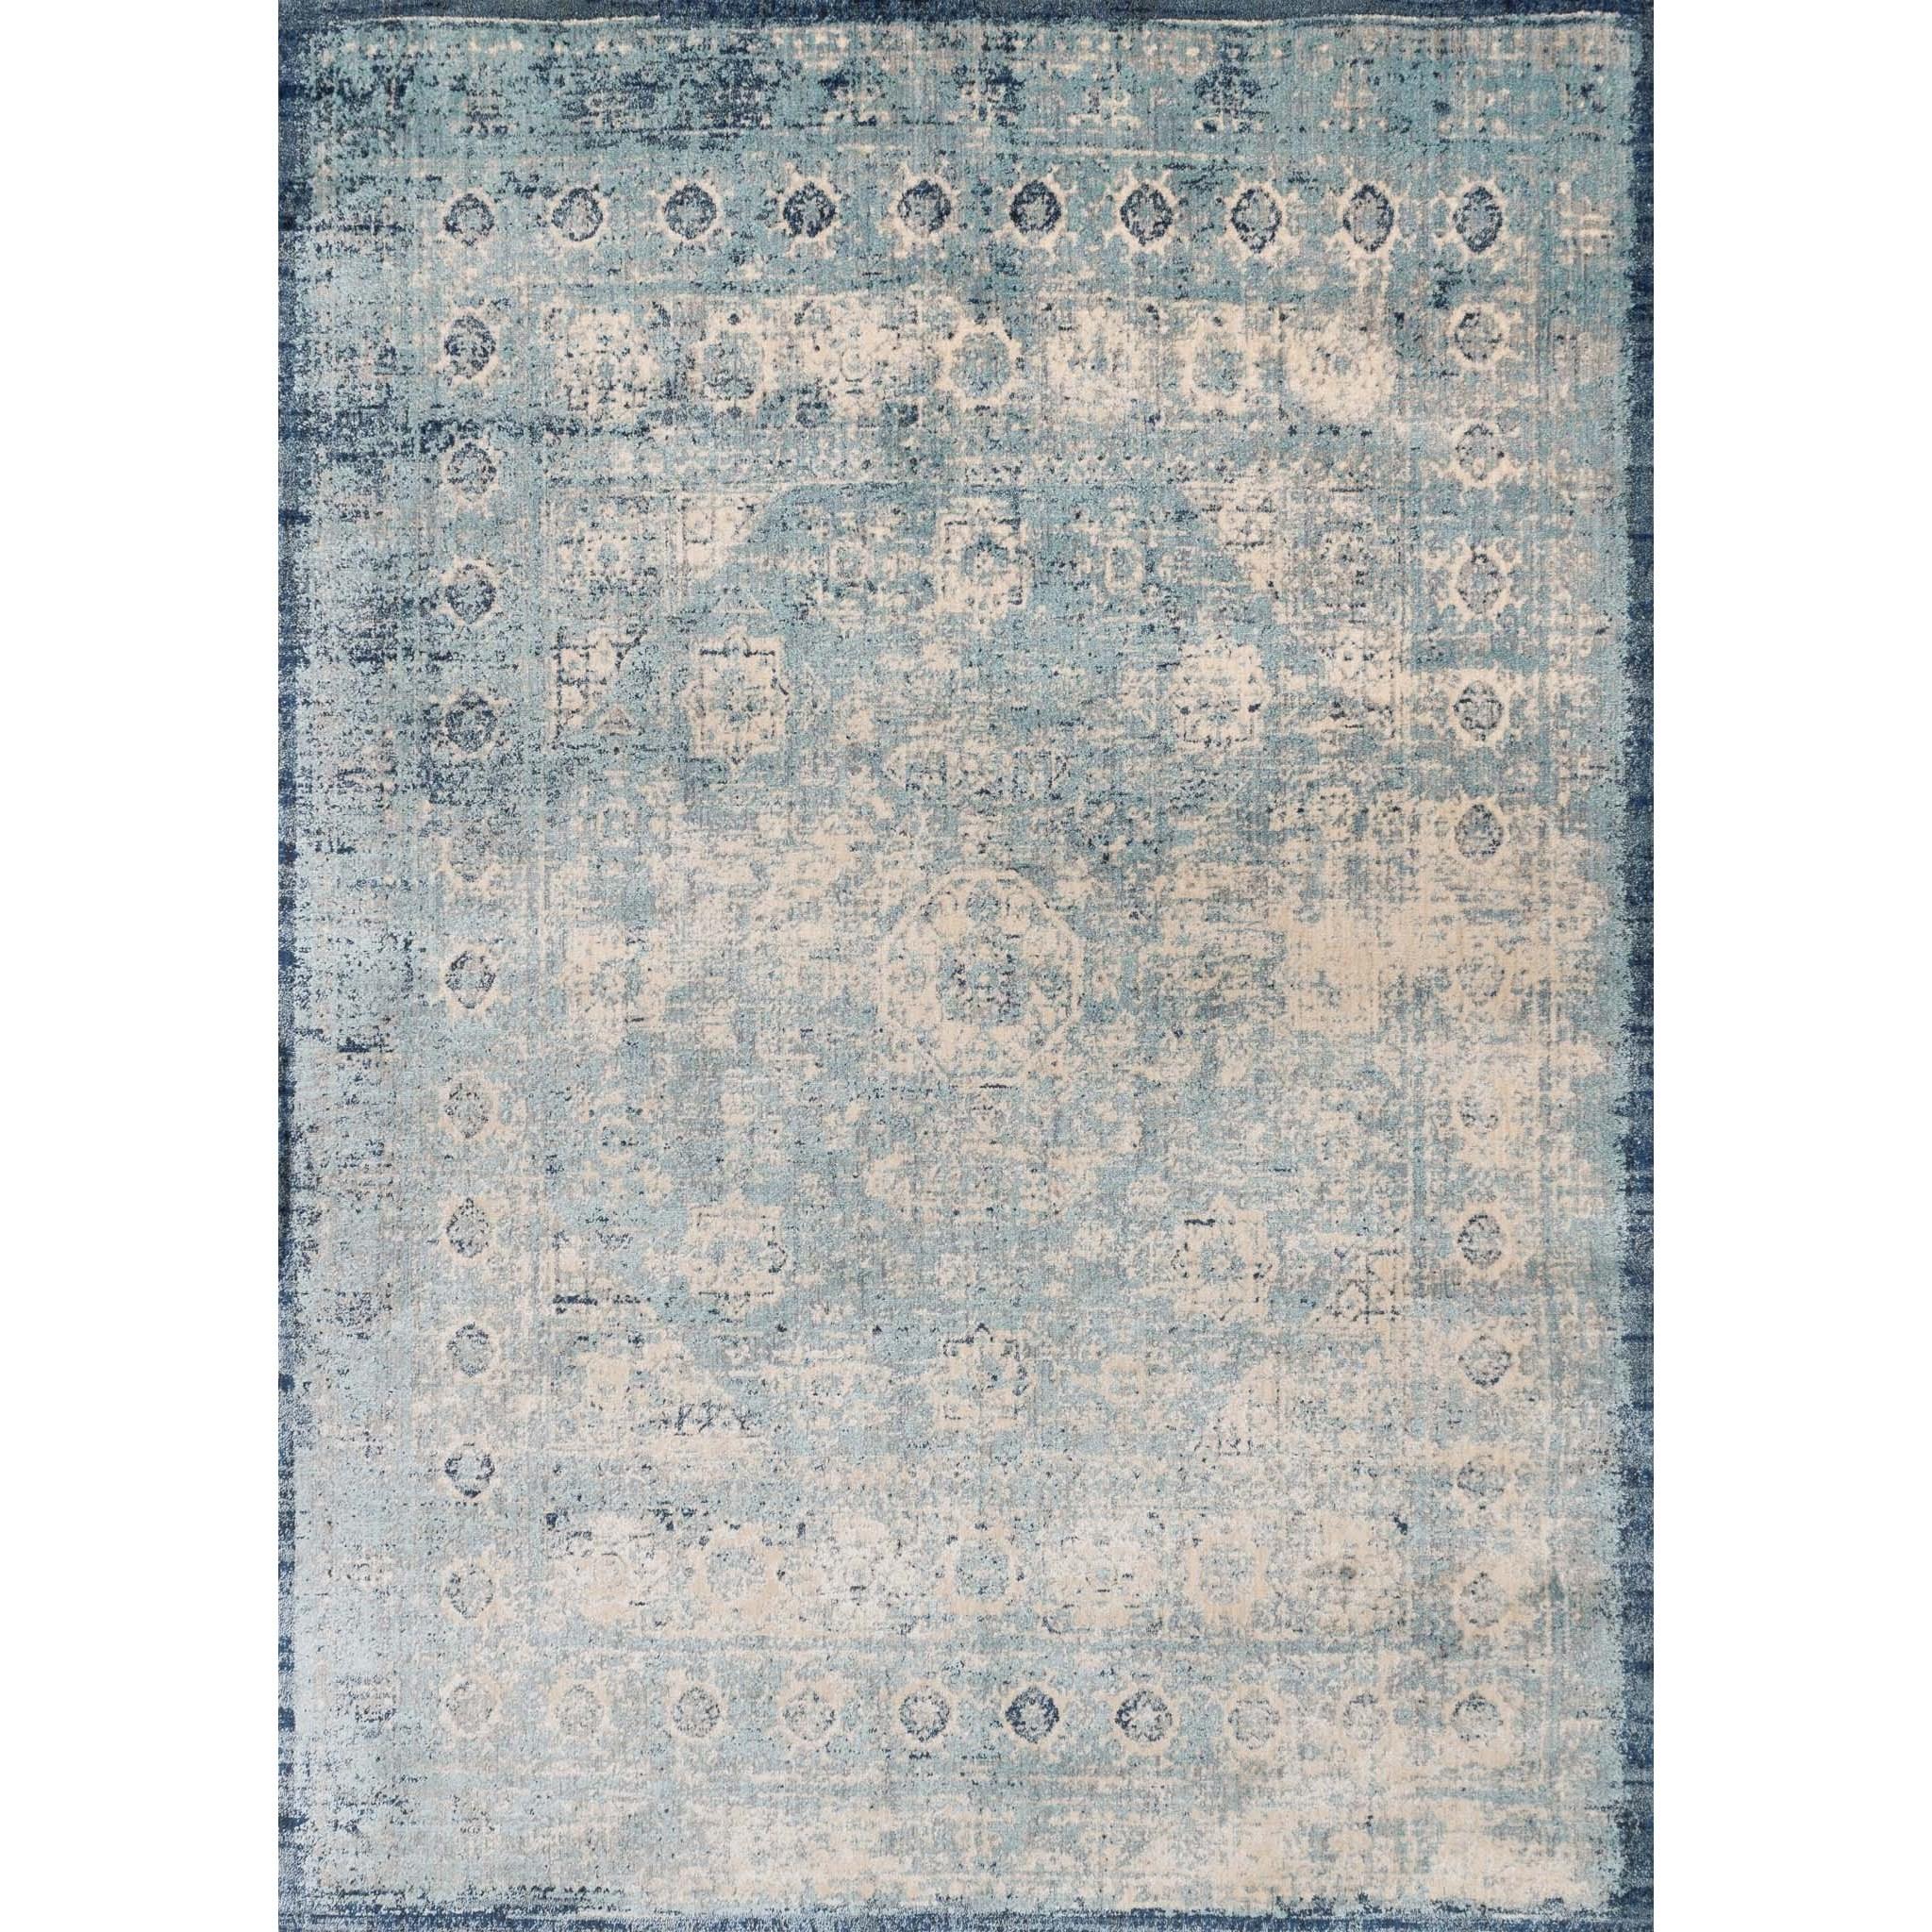 "Anastasia 12'-0"" x 15'-0"" Area Rug by Loloi Rugs at Sprintz Furniture"